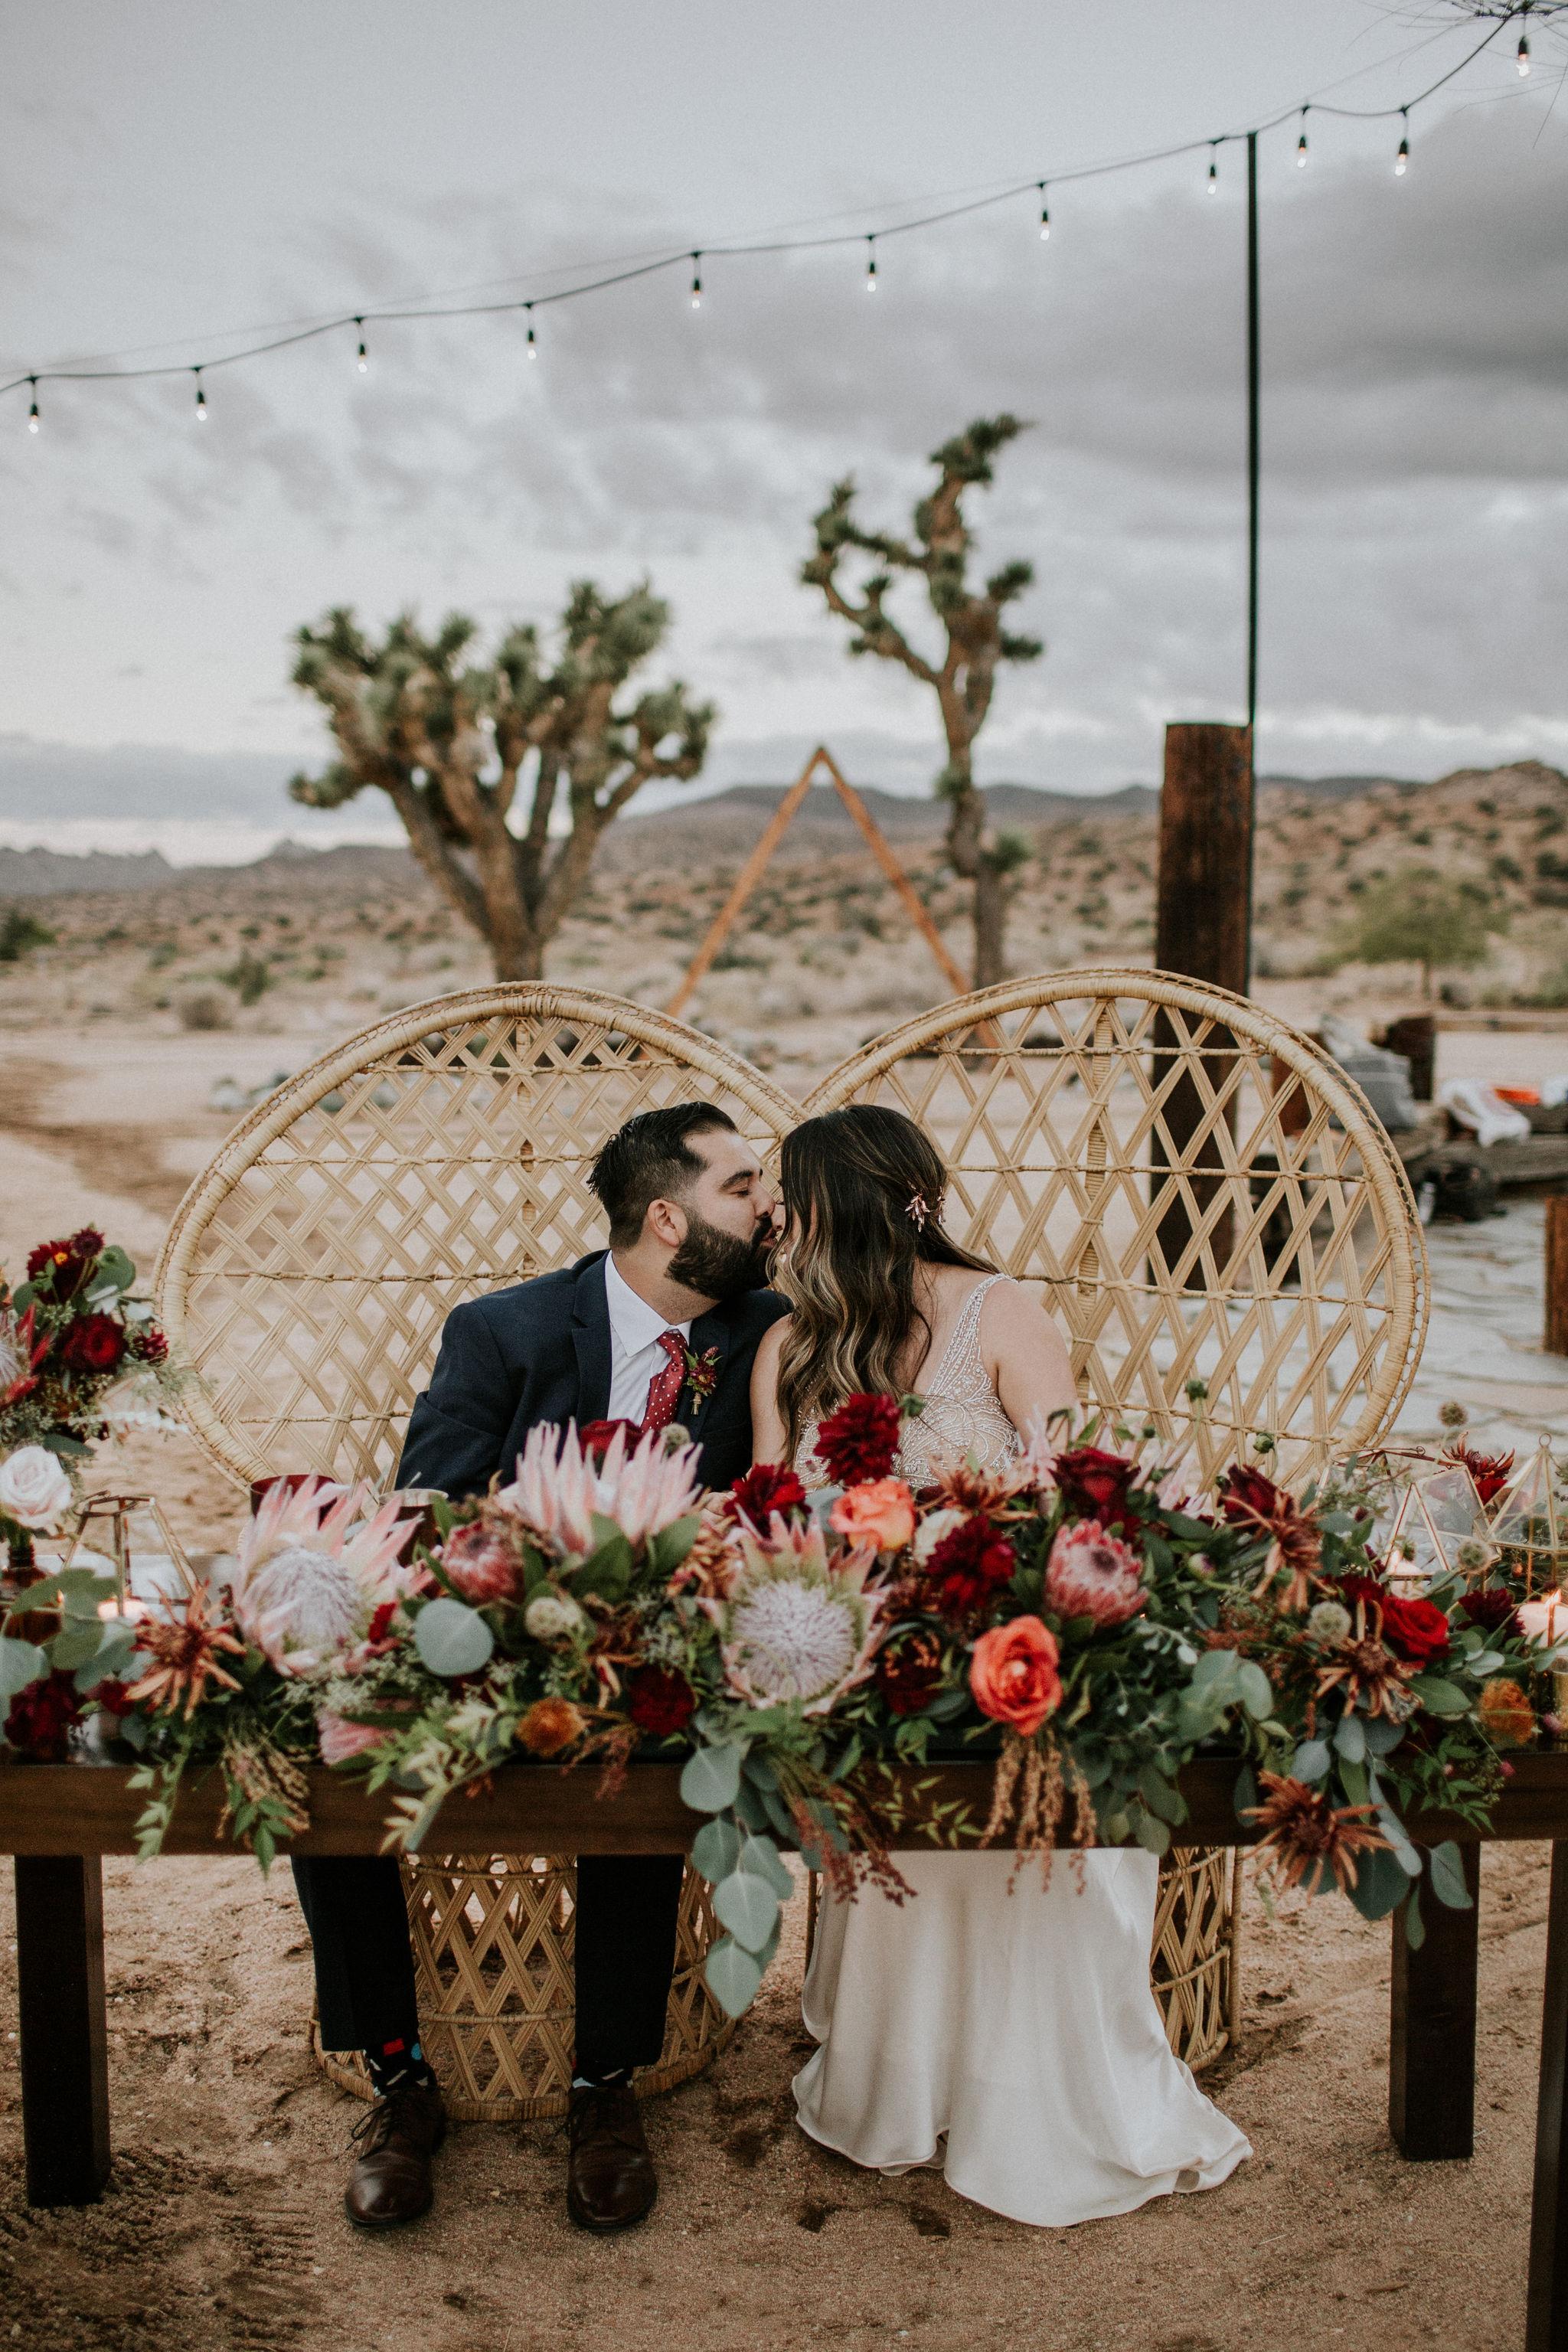 RimrockRanch-JoshuaTree-Wedding-Jami-Laree-911.jpg